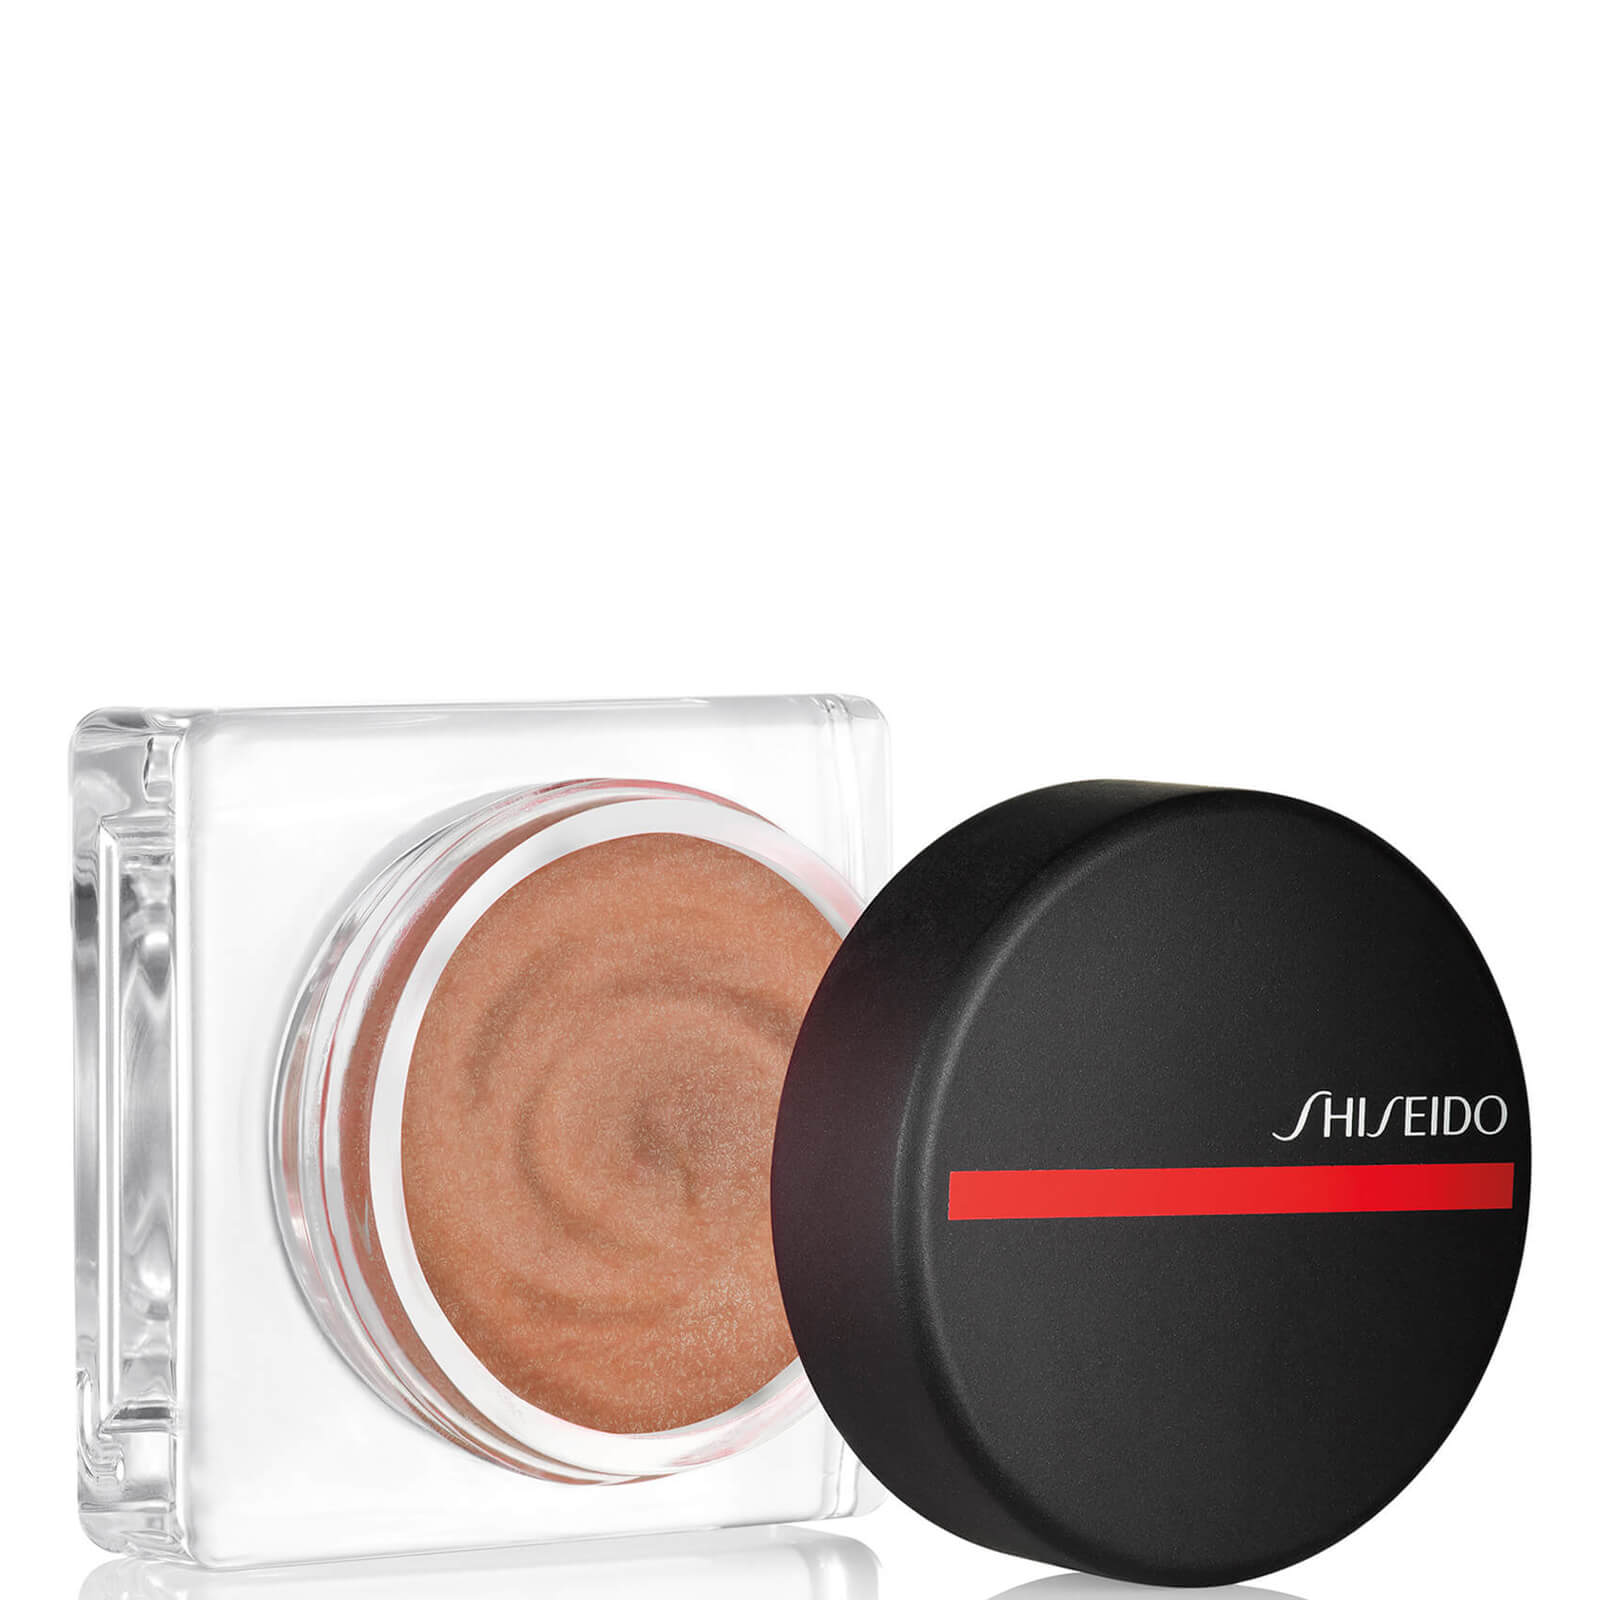 Купить Румяна-вуаль Shiseido Minimalist Whipped Powder Blush (различные оттенки) - Blush Eiko 04